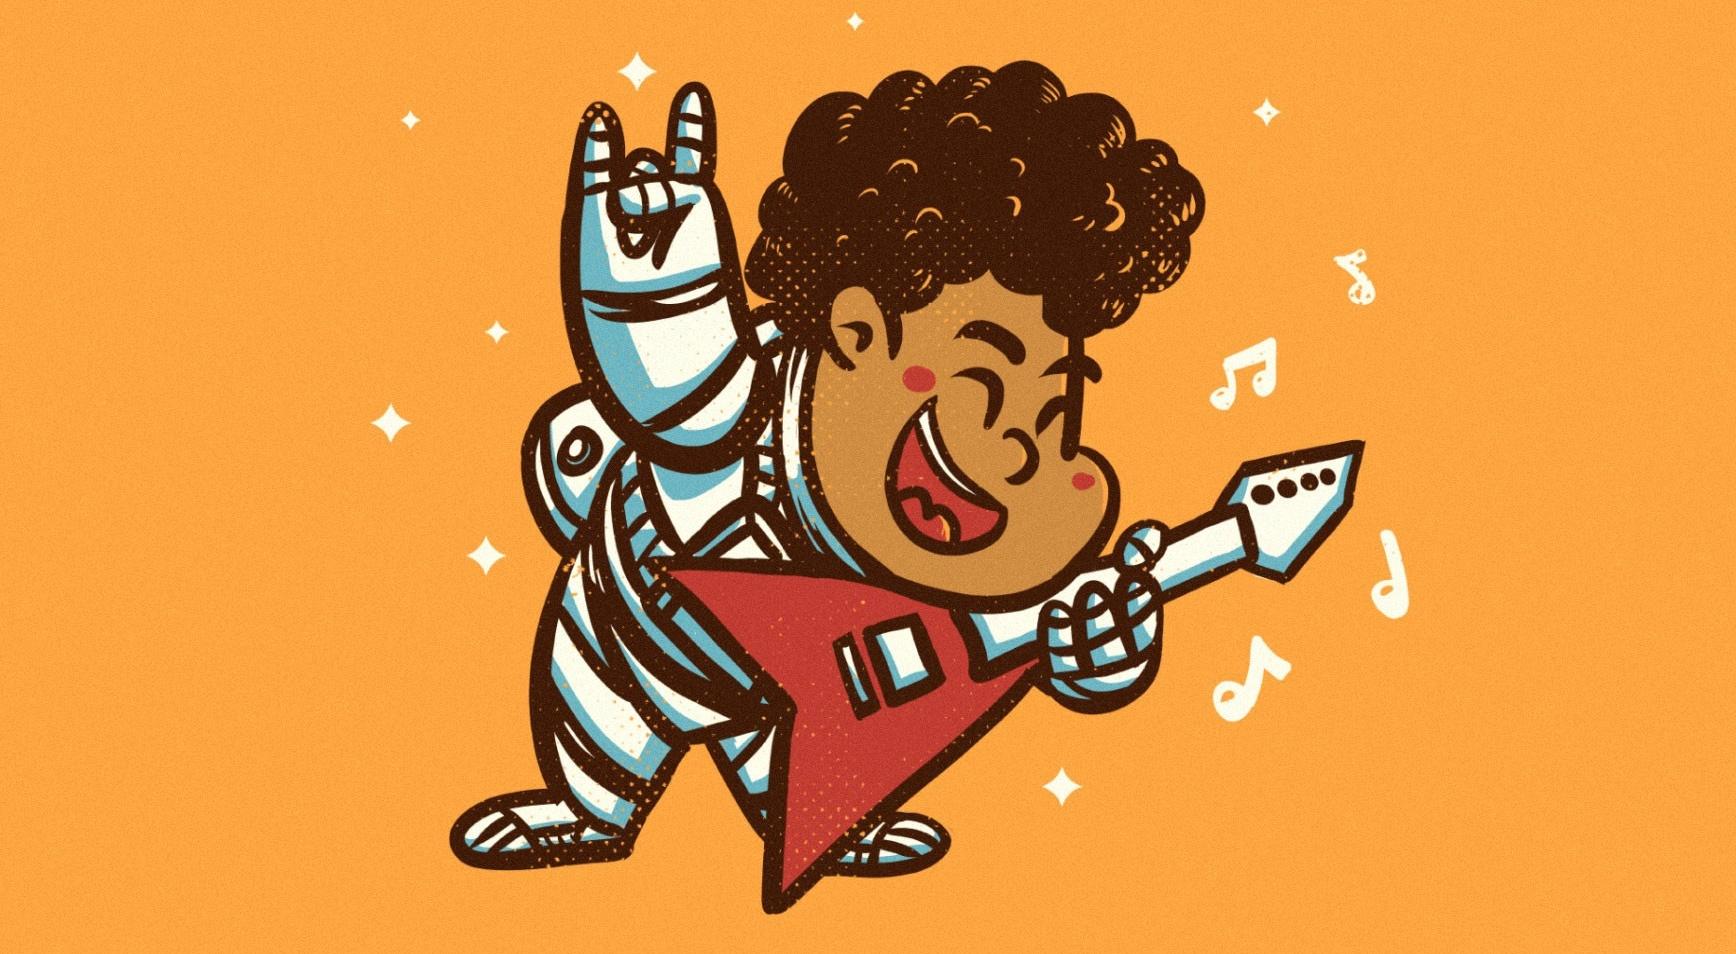 Cartoon astronaut illustration for kid's shirt